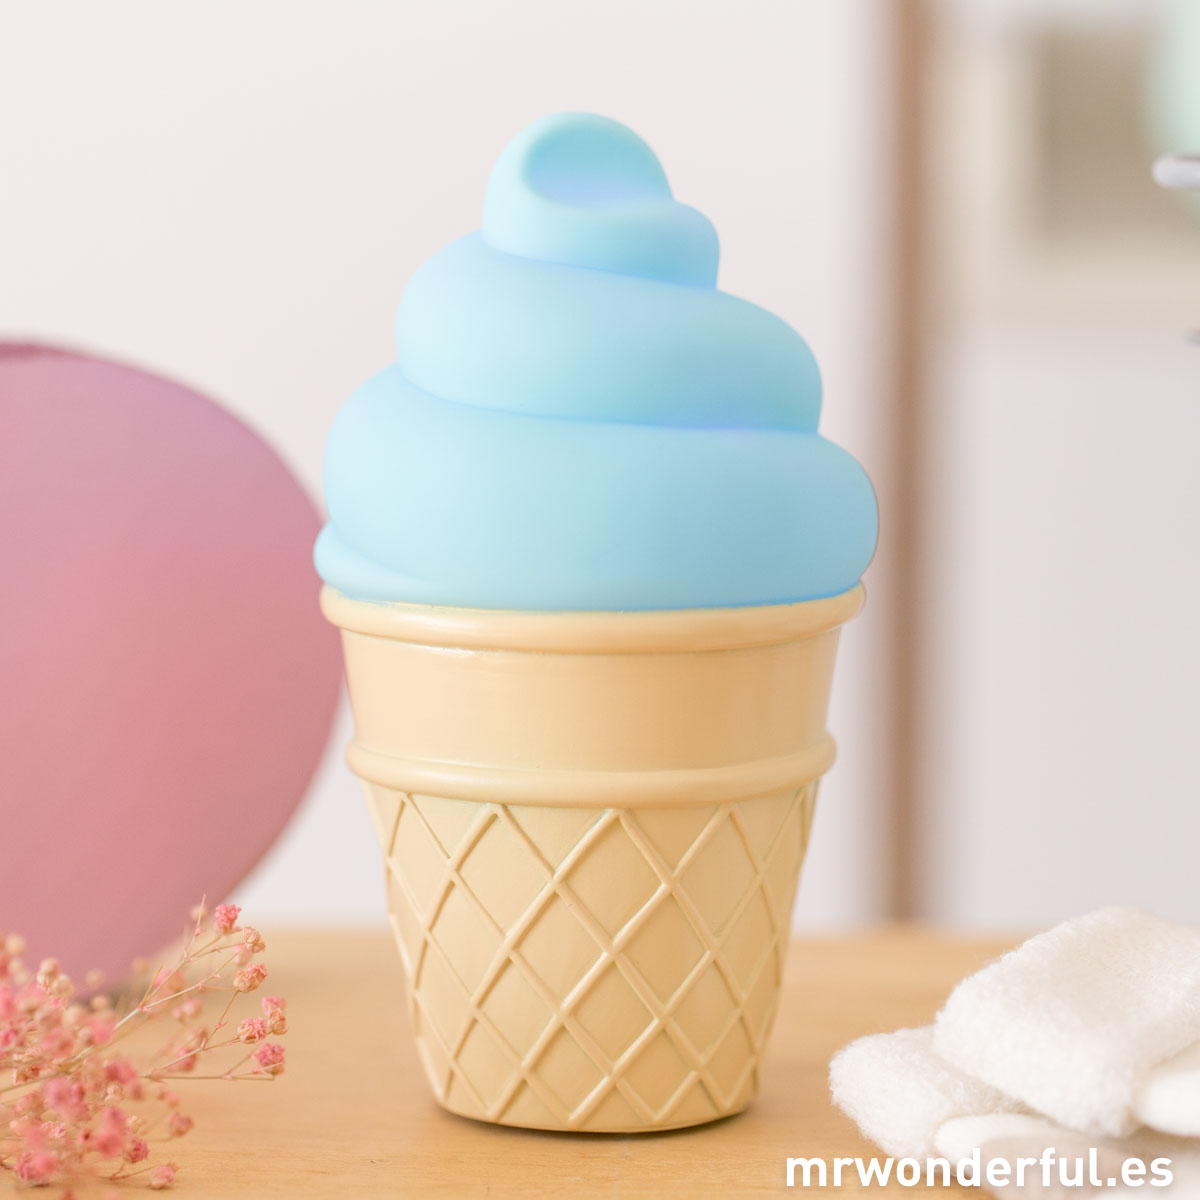 mrwonderful_PRA02817_Luz-nocturna-Icecream-color-azul-17